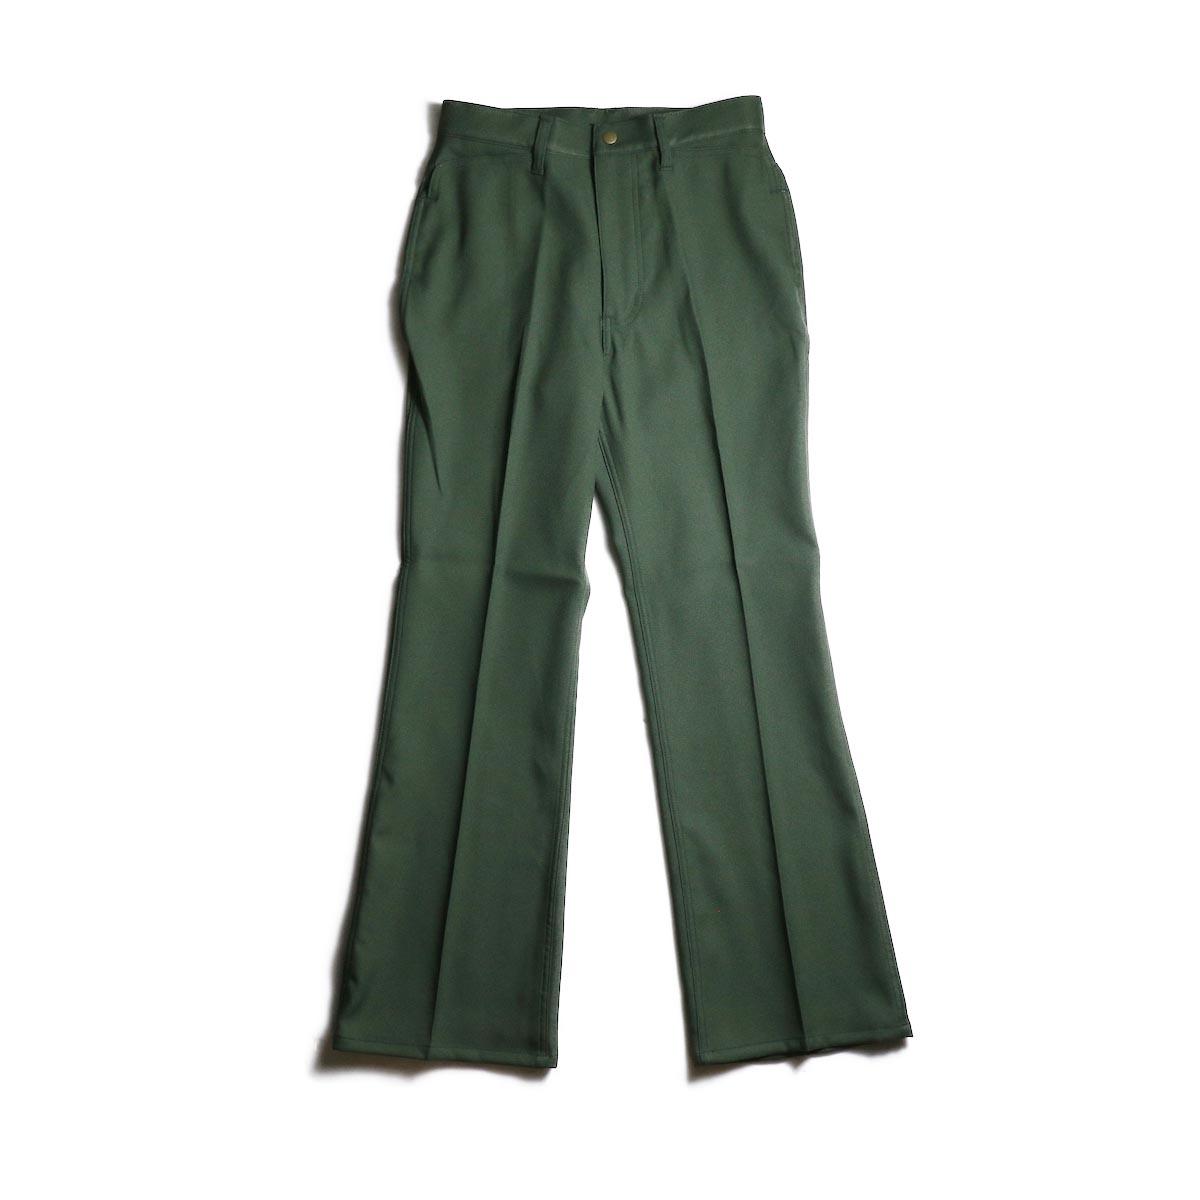 Needles / Boot Cut Jean -Poly Twill (Green)